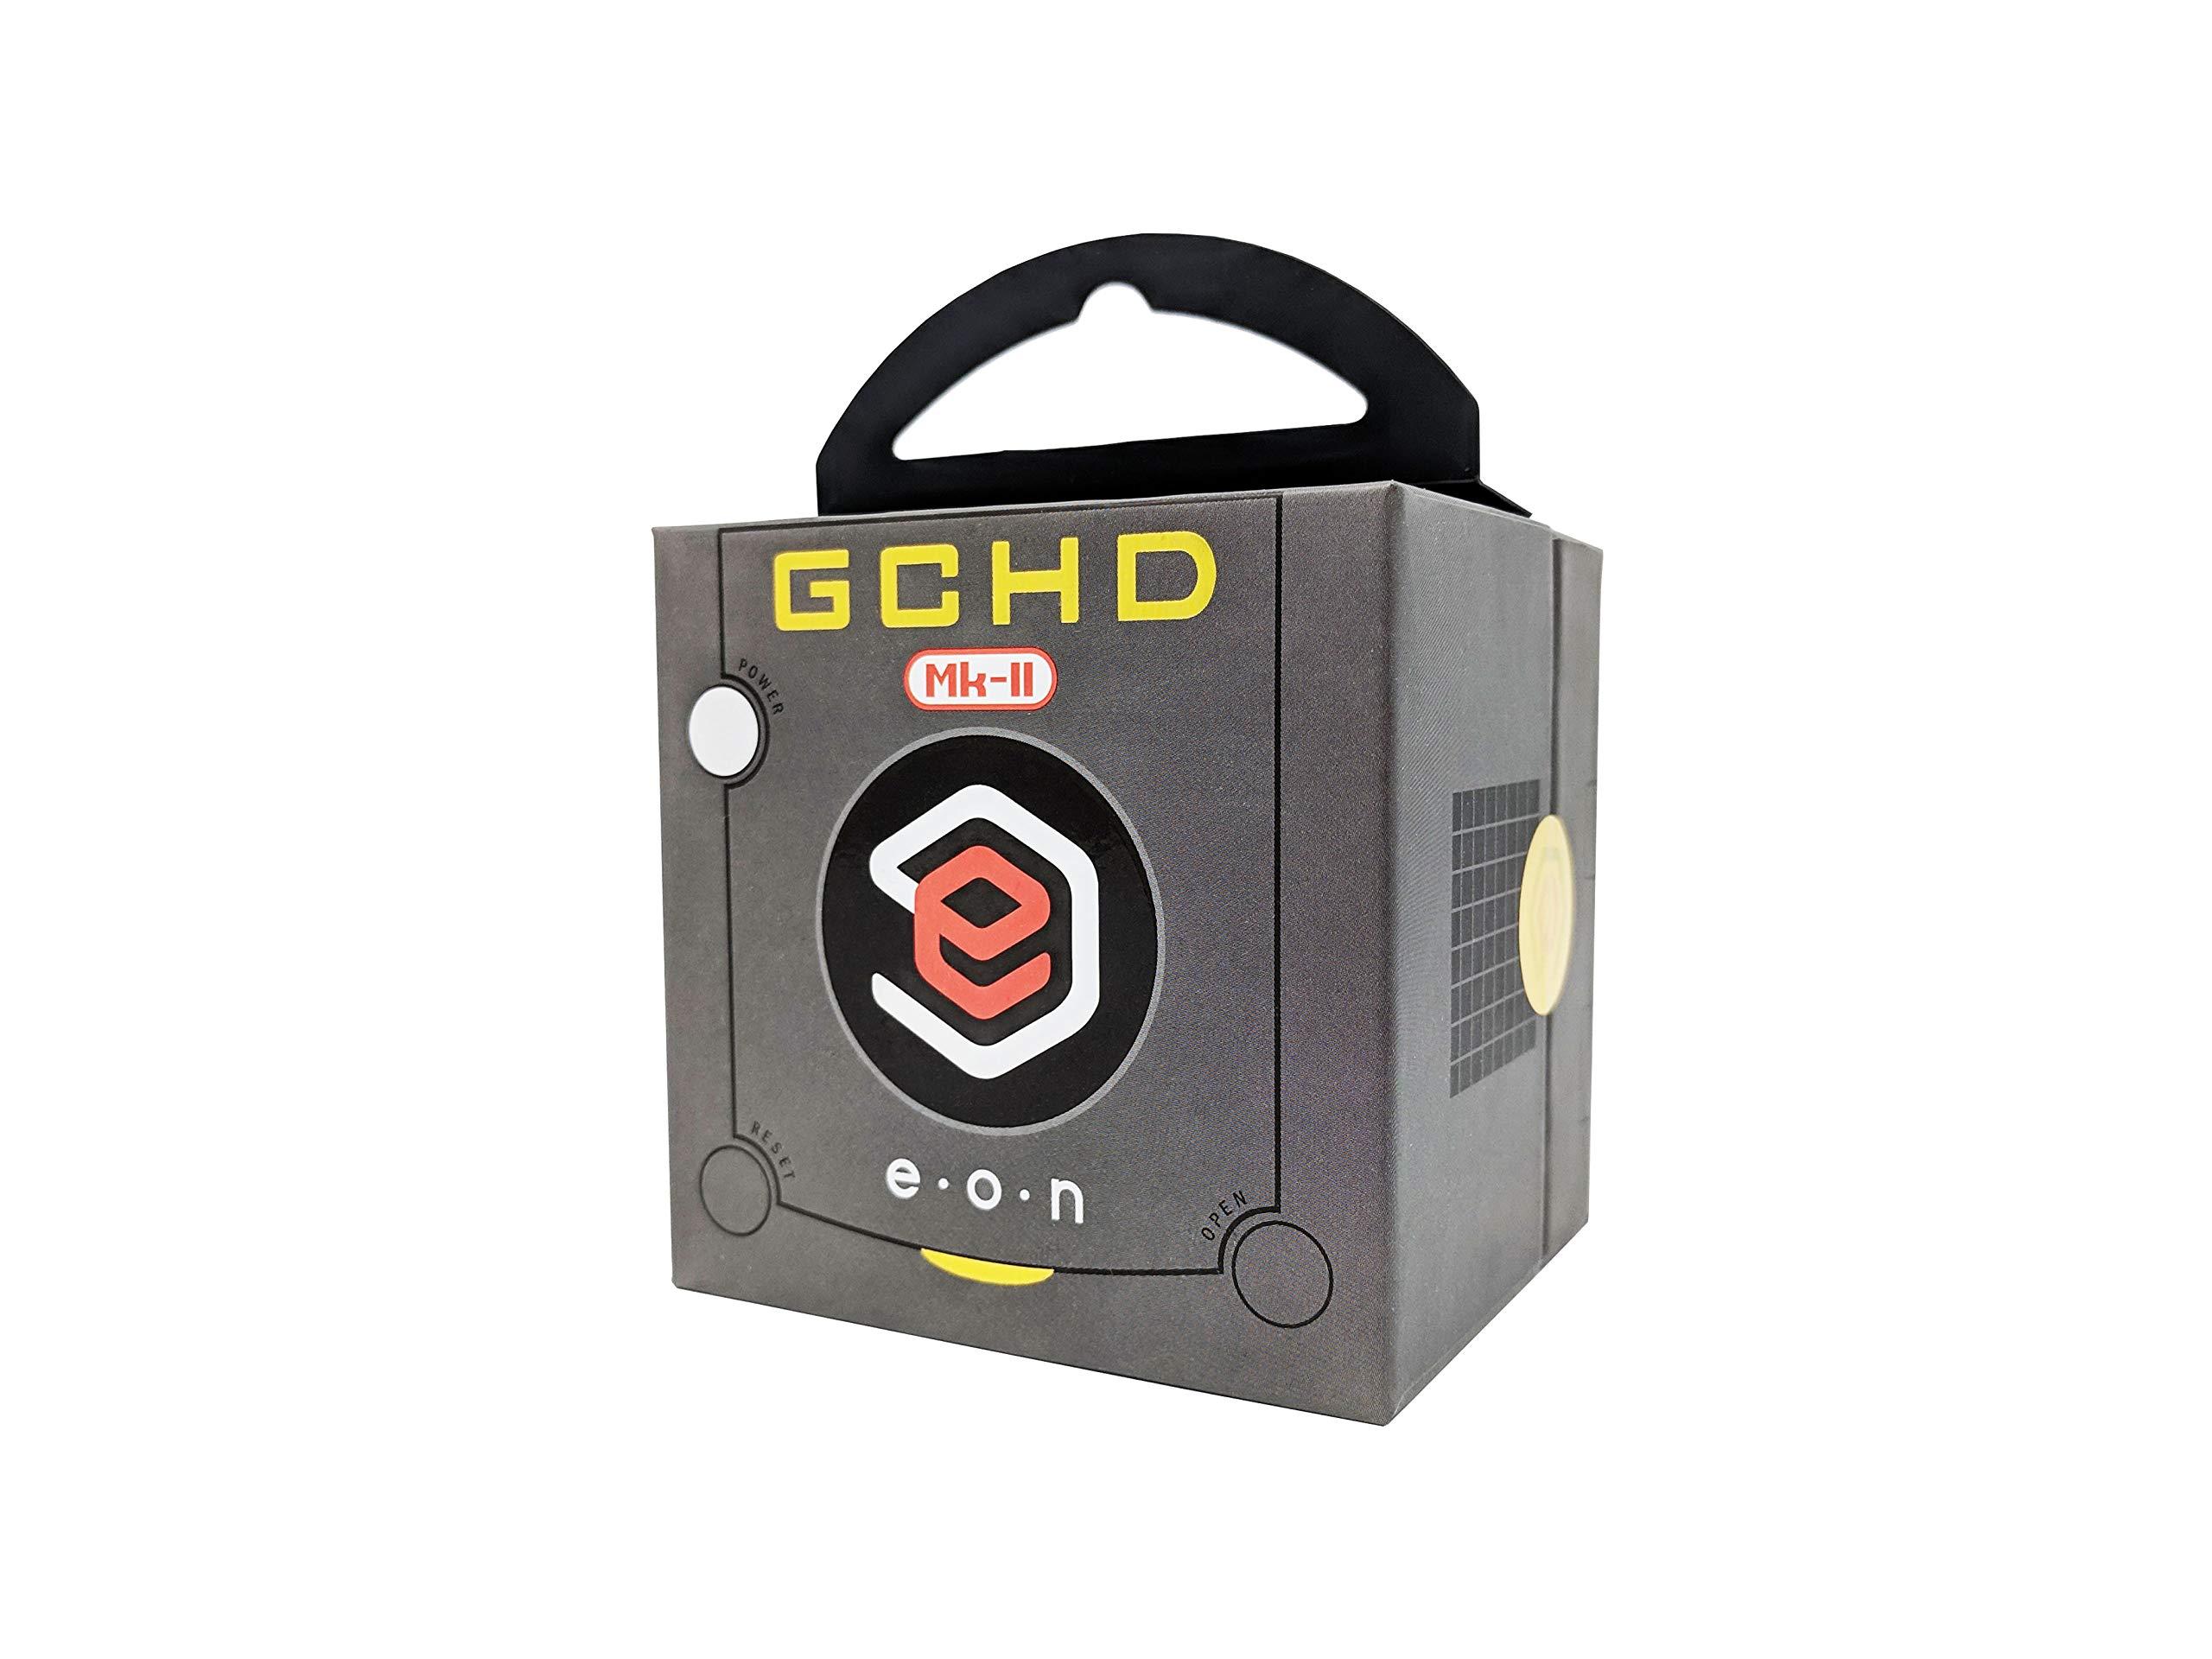 GCHD Mk-II | GameCube HDMI Adapter (RGBlack) by Eon (Image #2)